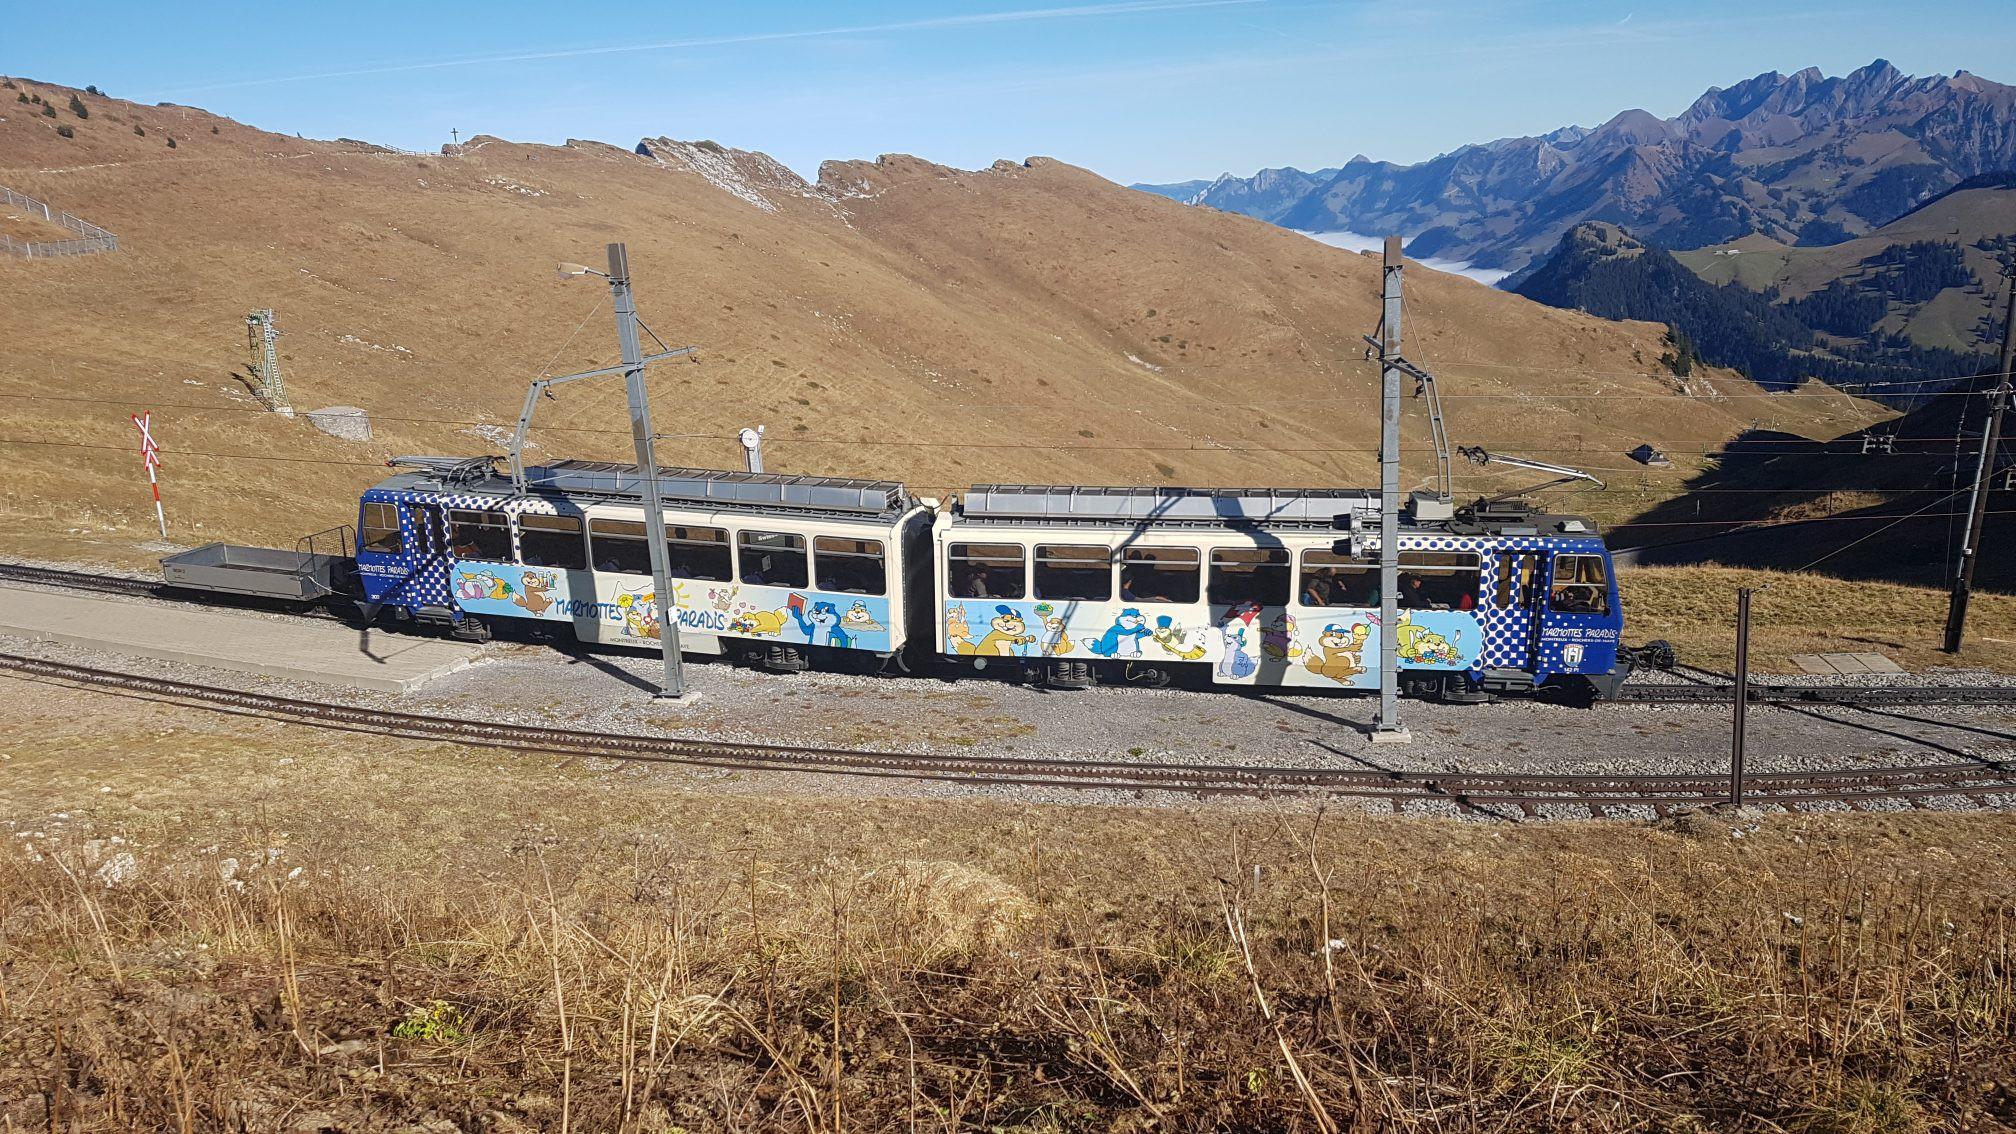 Train Montreux - Rochers de Naye